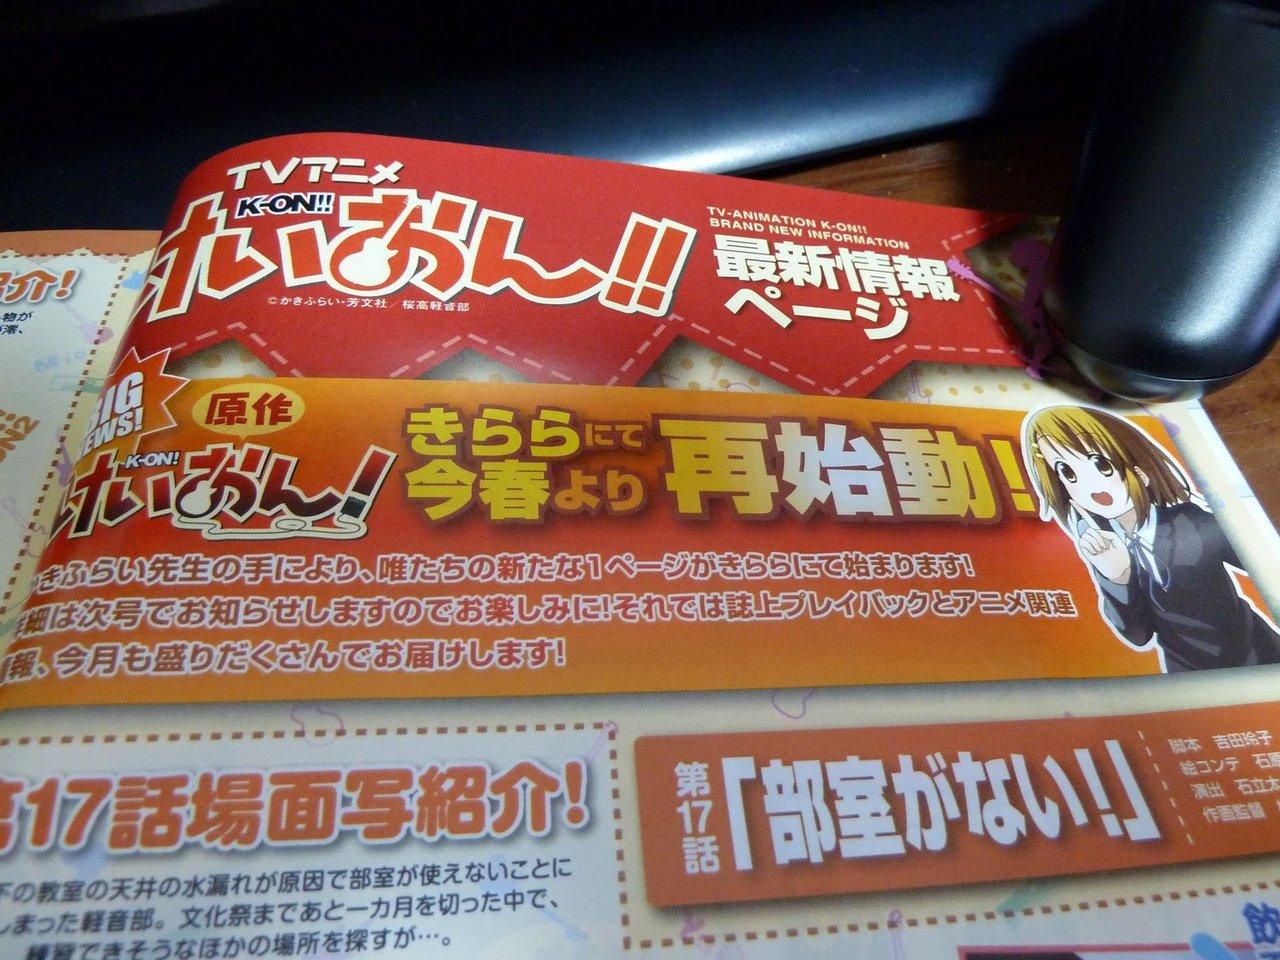 http://livedoor.2.blogimg.jp/otaku_blog/imgs/7/b/7b73db3d.jpg